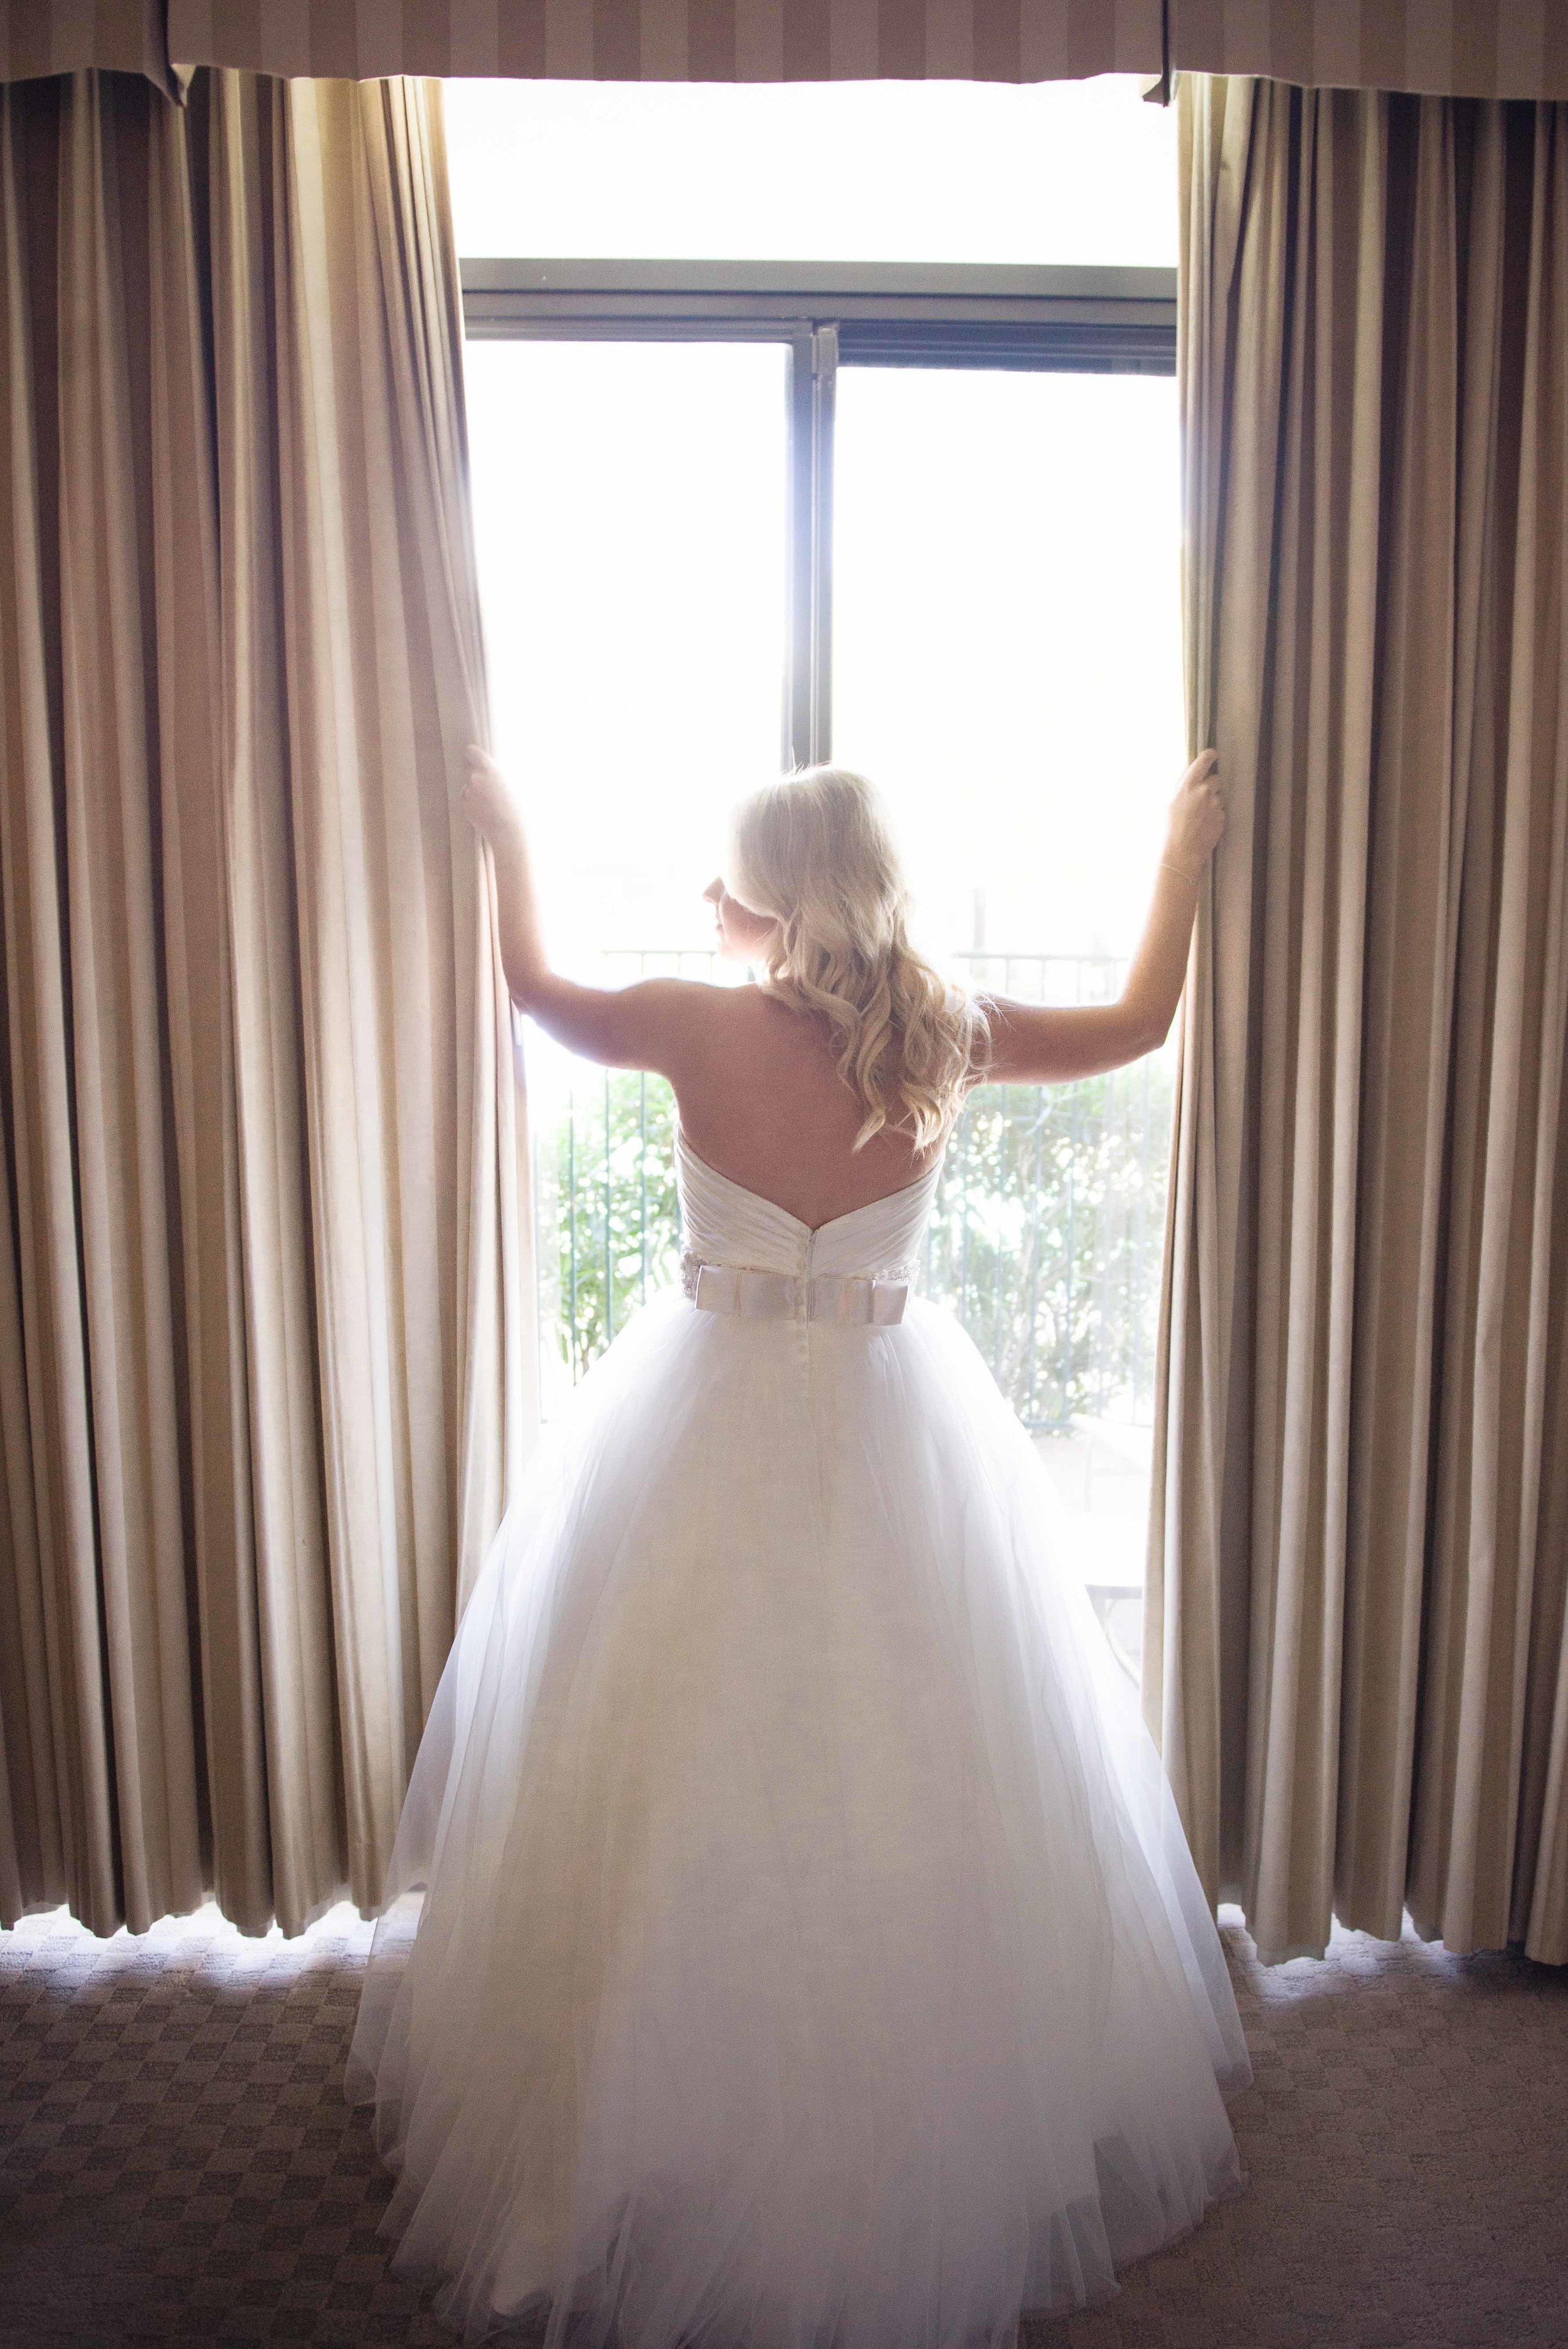 weddingwebsitesmallerpics-46.jpg